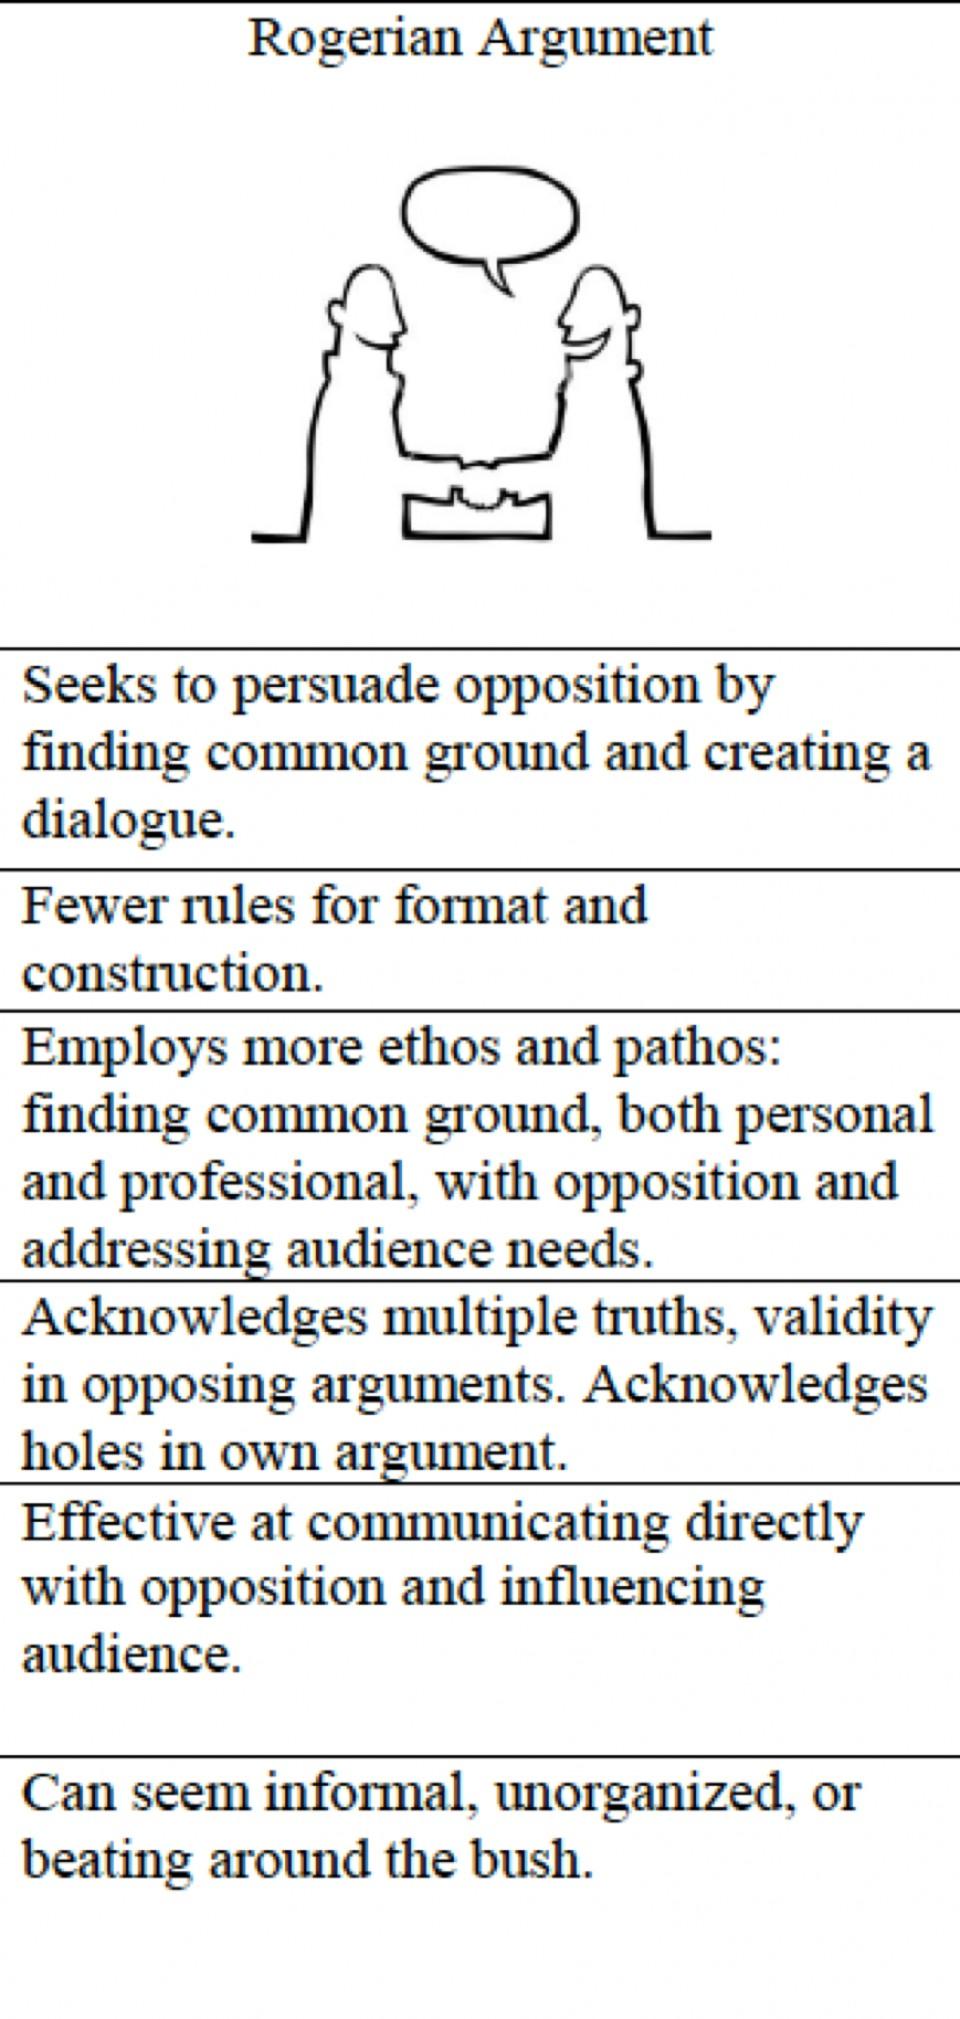 015 Essay Example Best Rogerian Argument Sentence Abortion Style Topics 960